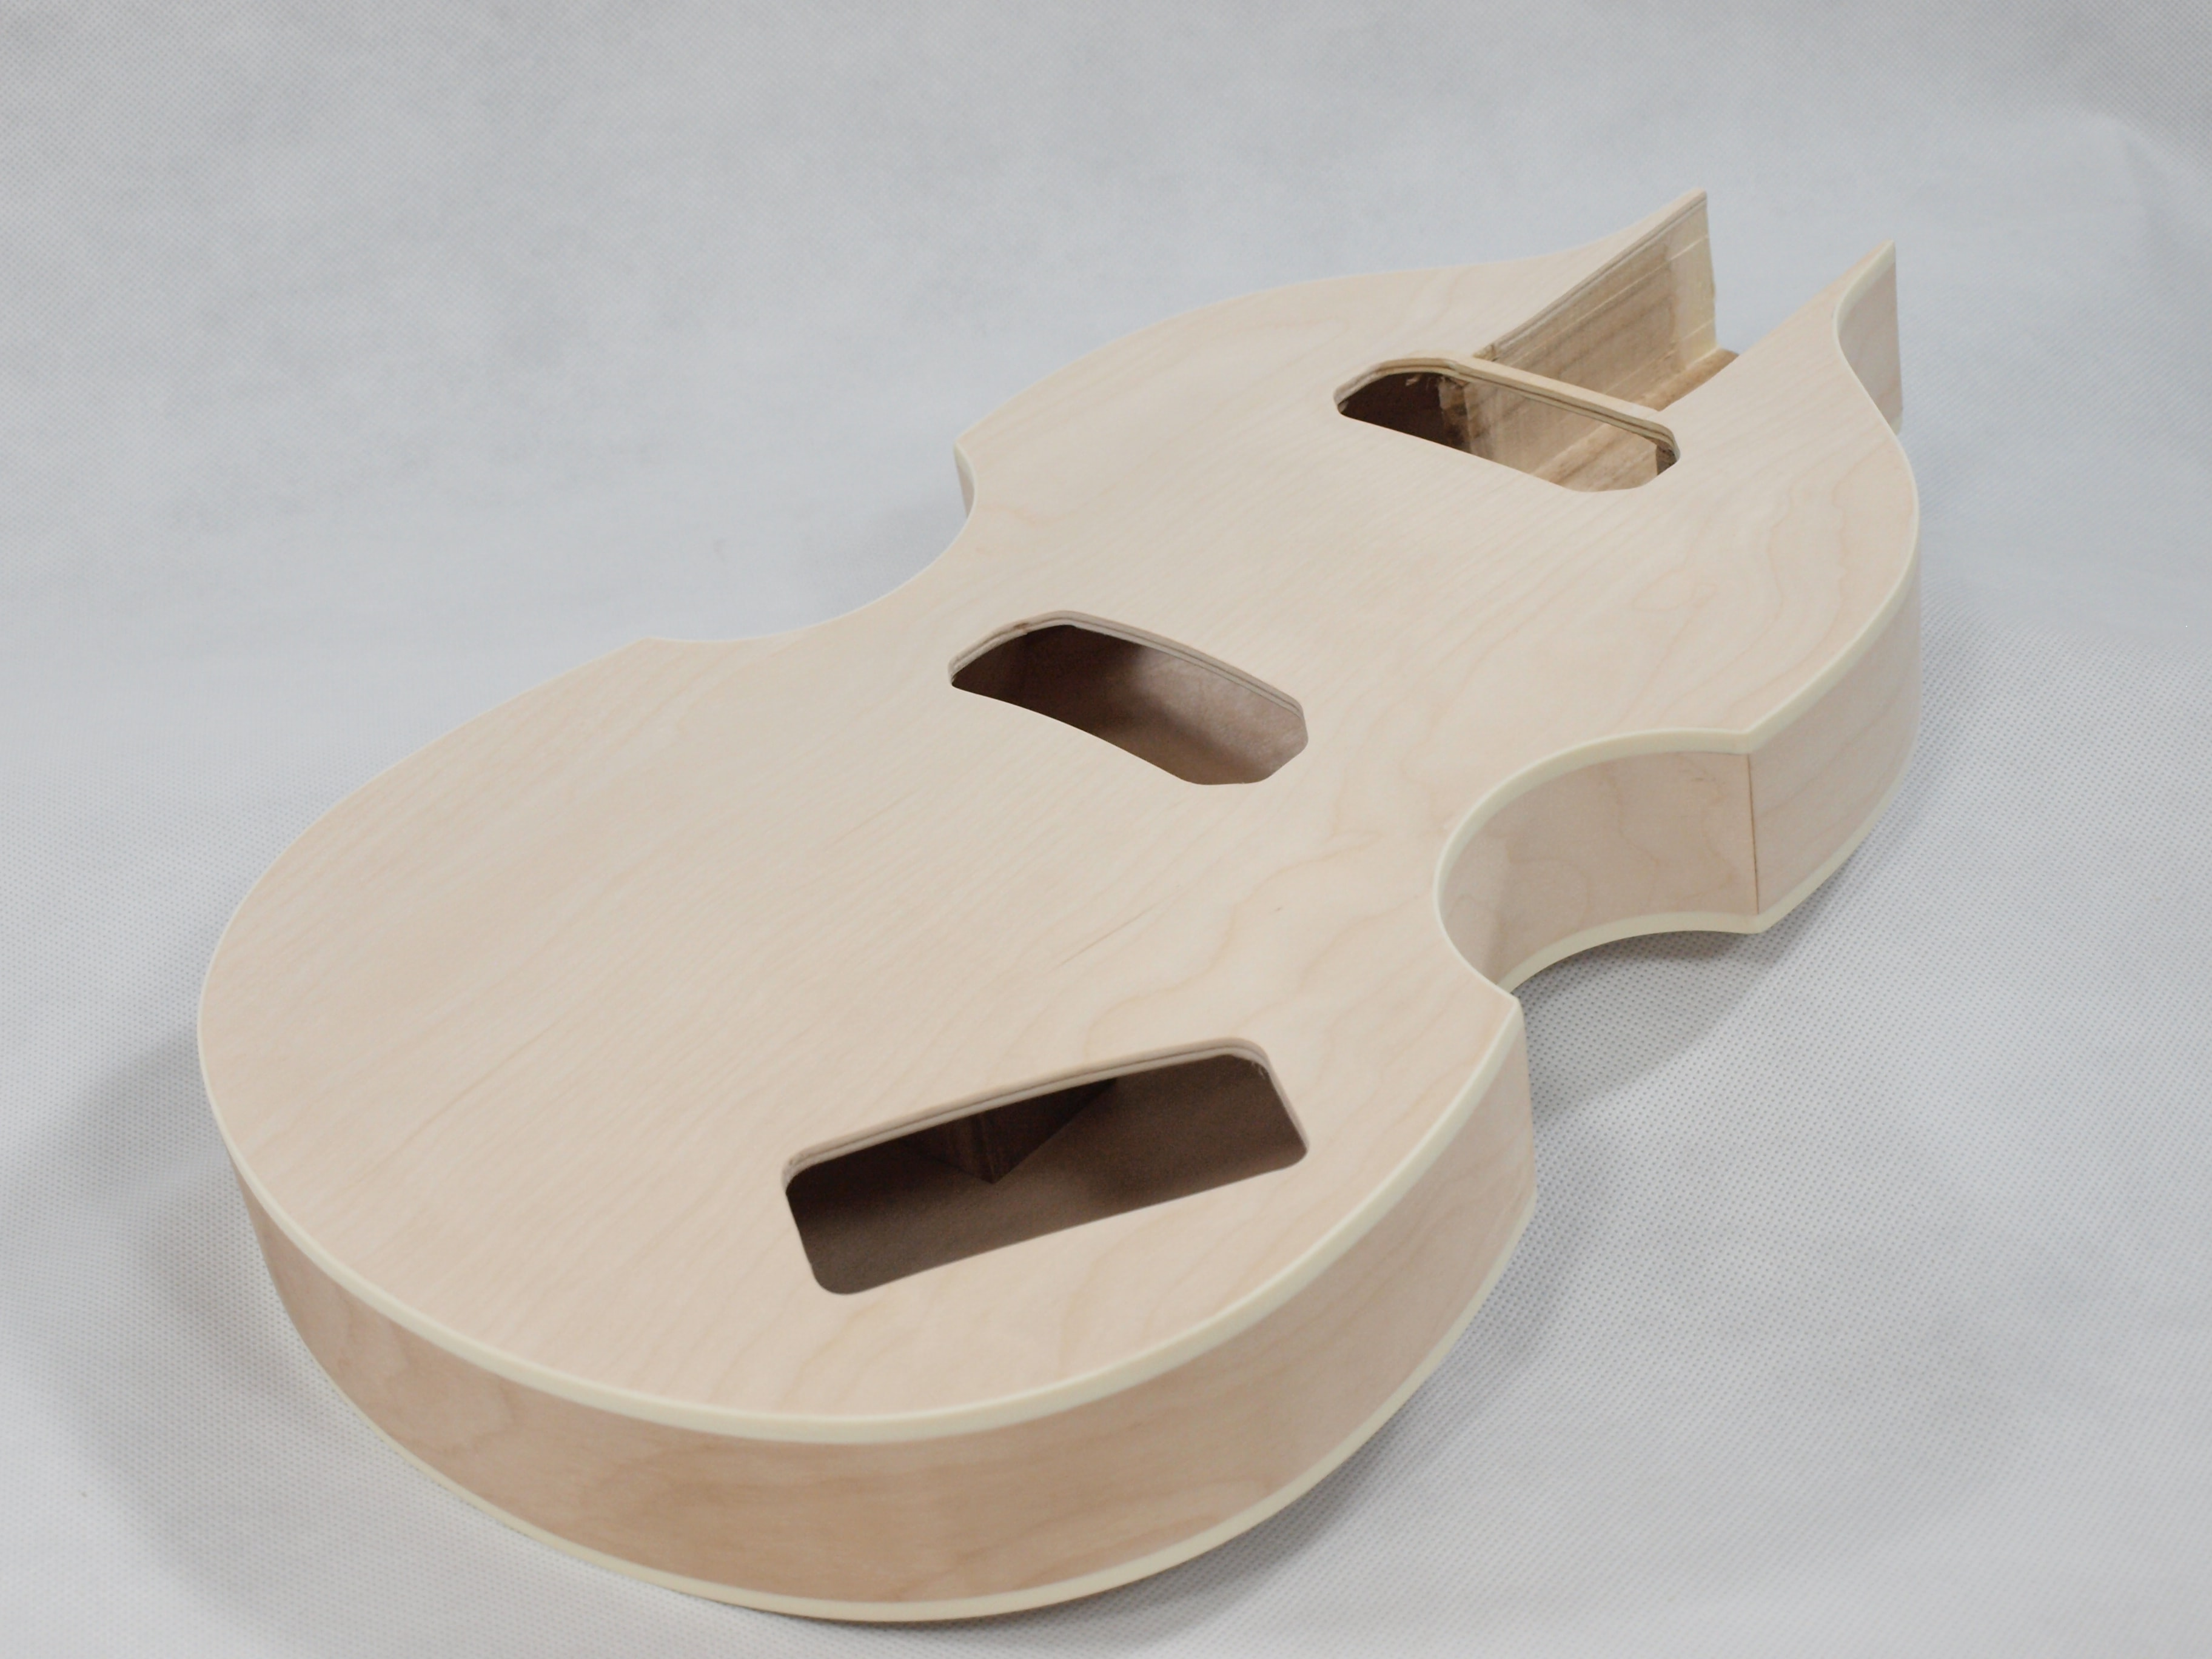 Solo Beatles Violin Bass Diy Guitar Kit Music Gear Wiring Diagram Kits